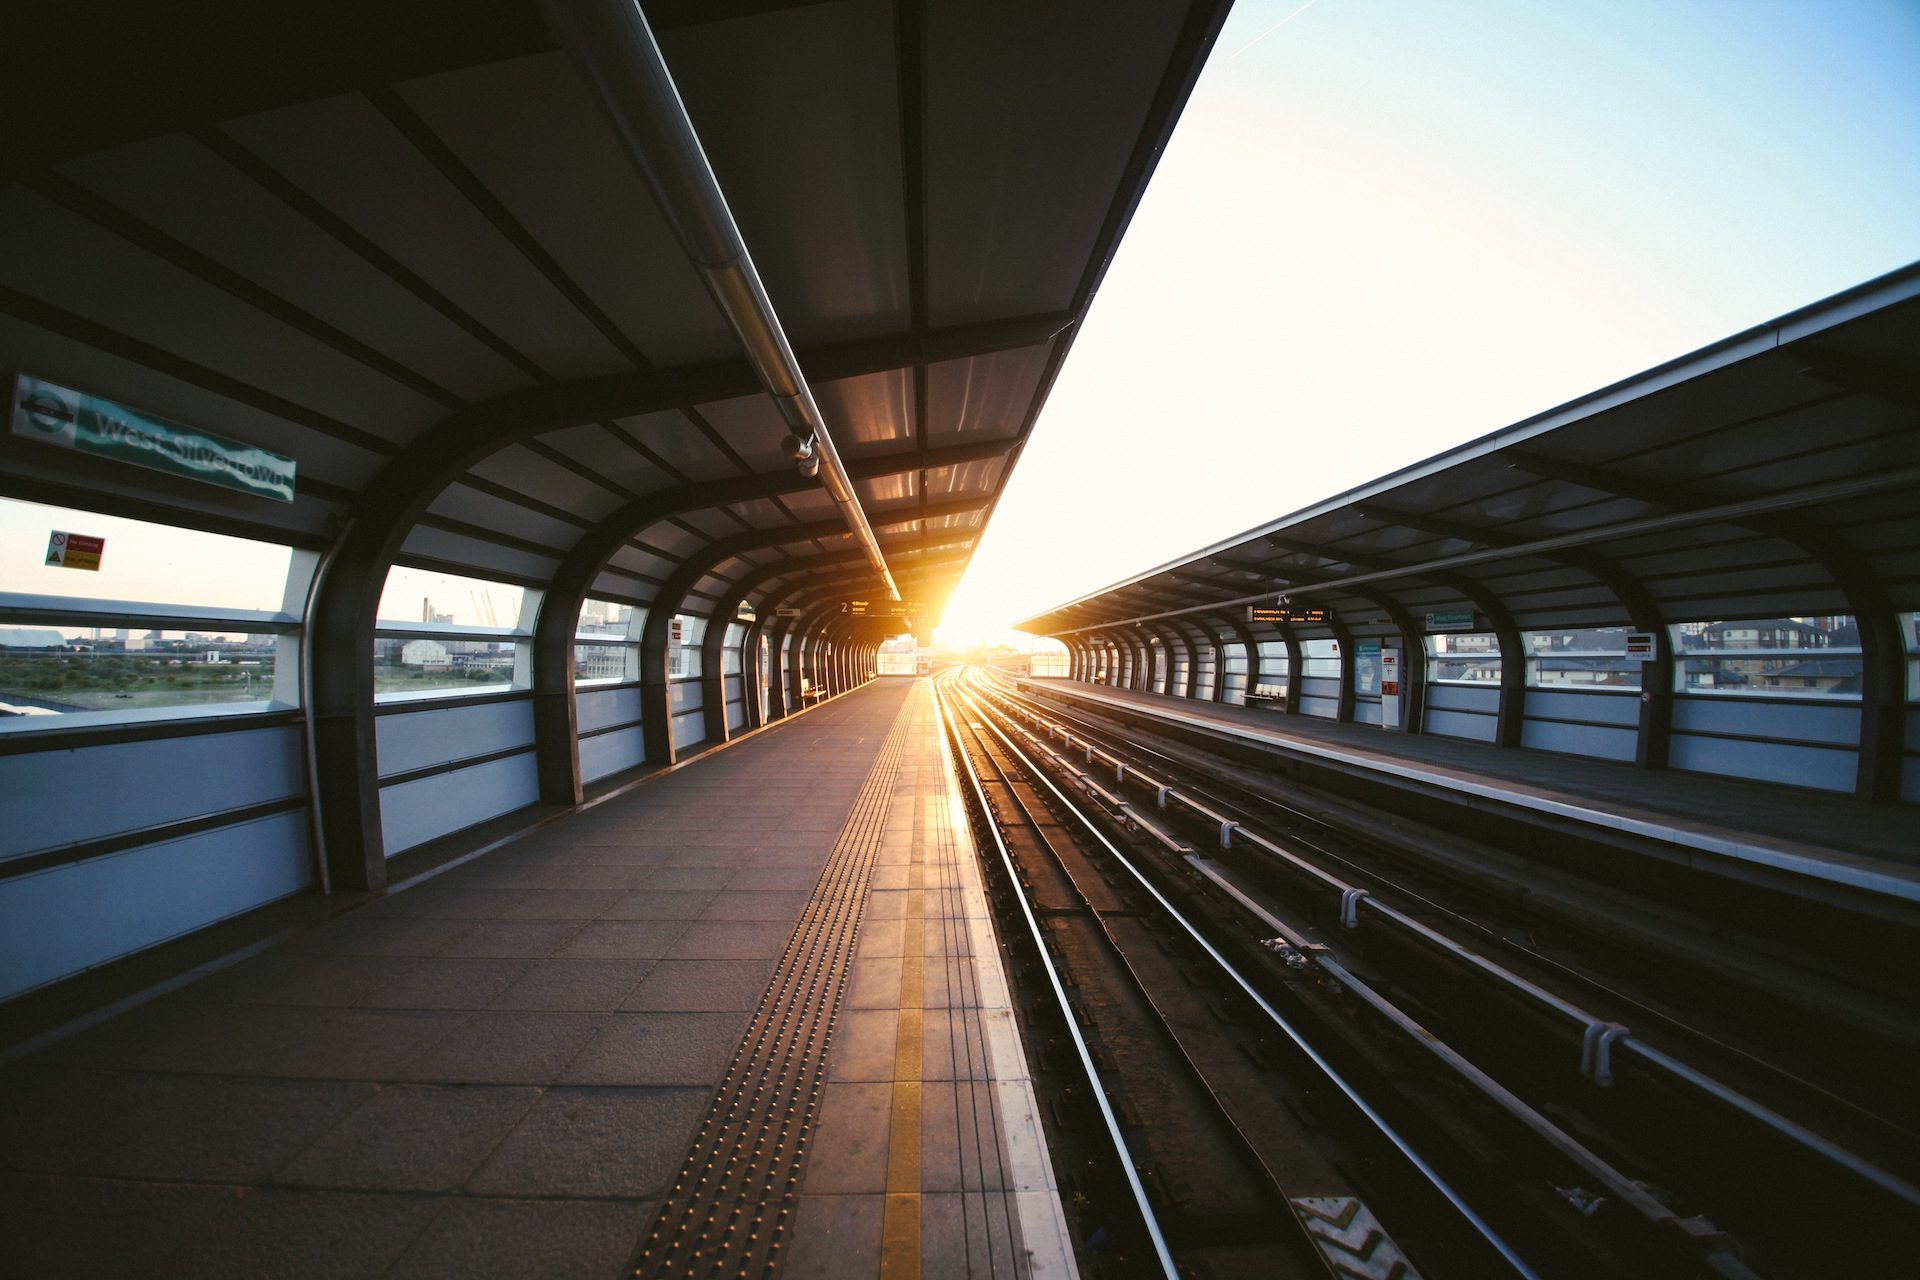 piattaforma, treno, vuoto, luce, Sole, Tramonto - Sfondi HD - Professor-falken.com